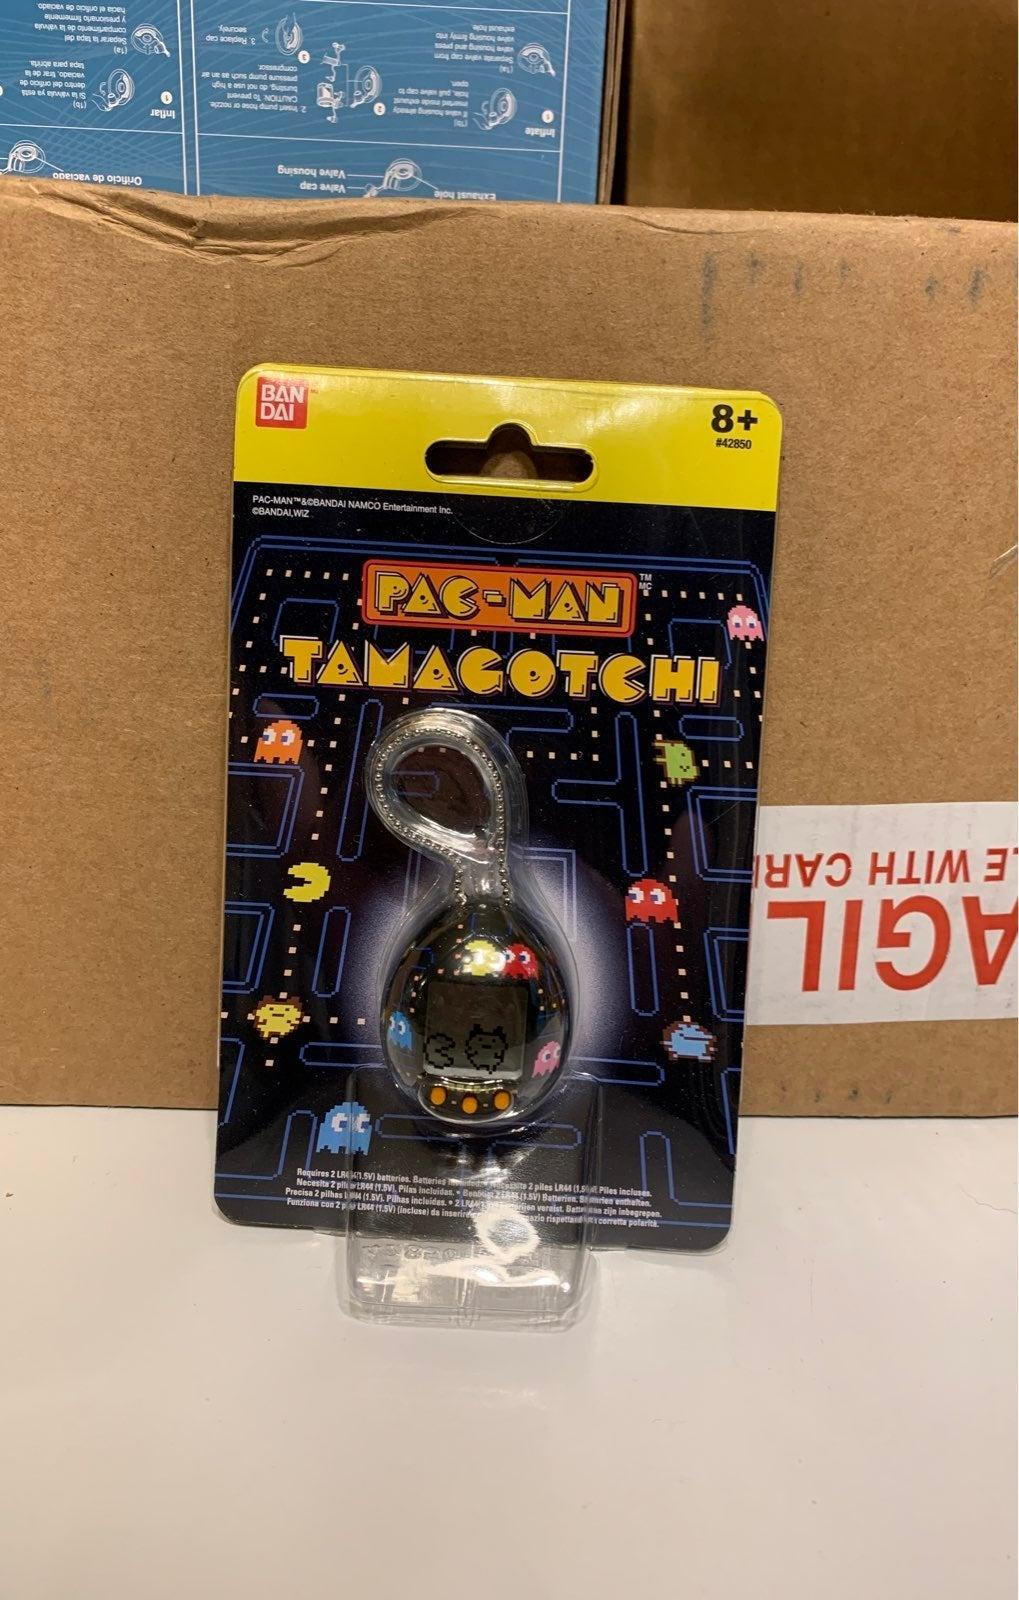 Tamagotchi For Dmitri